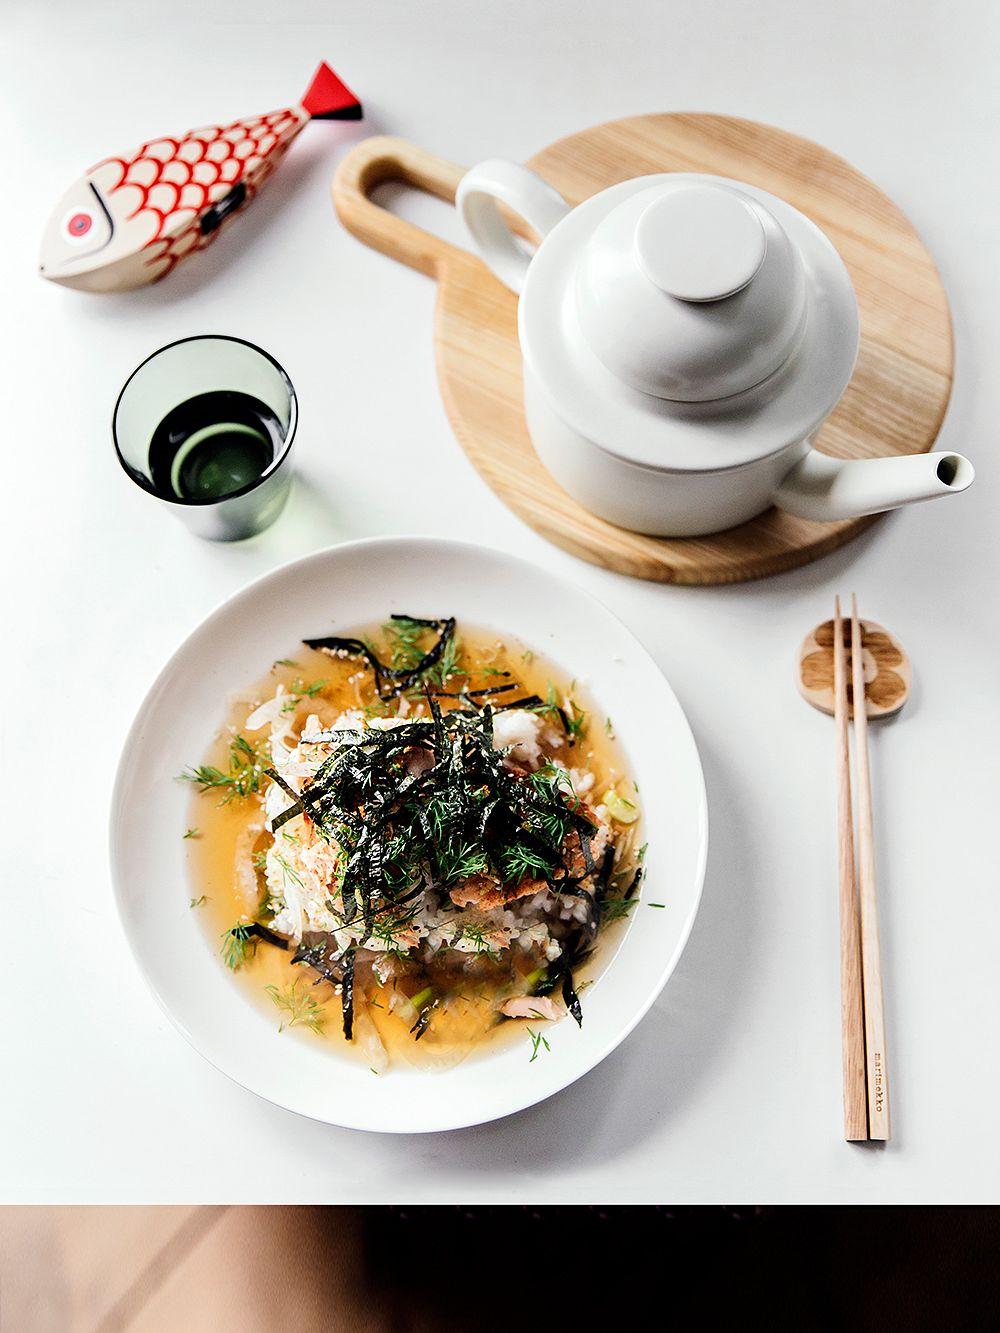 Ochazuke with dill and salmon